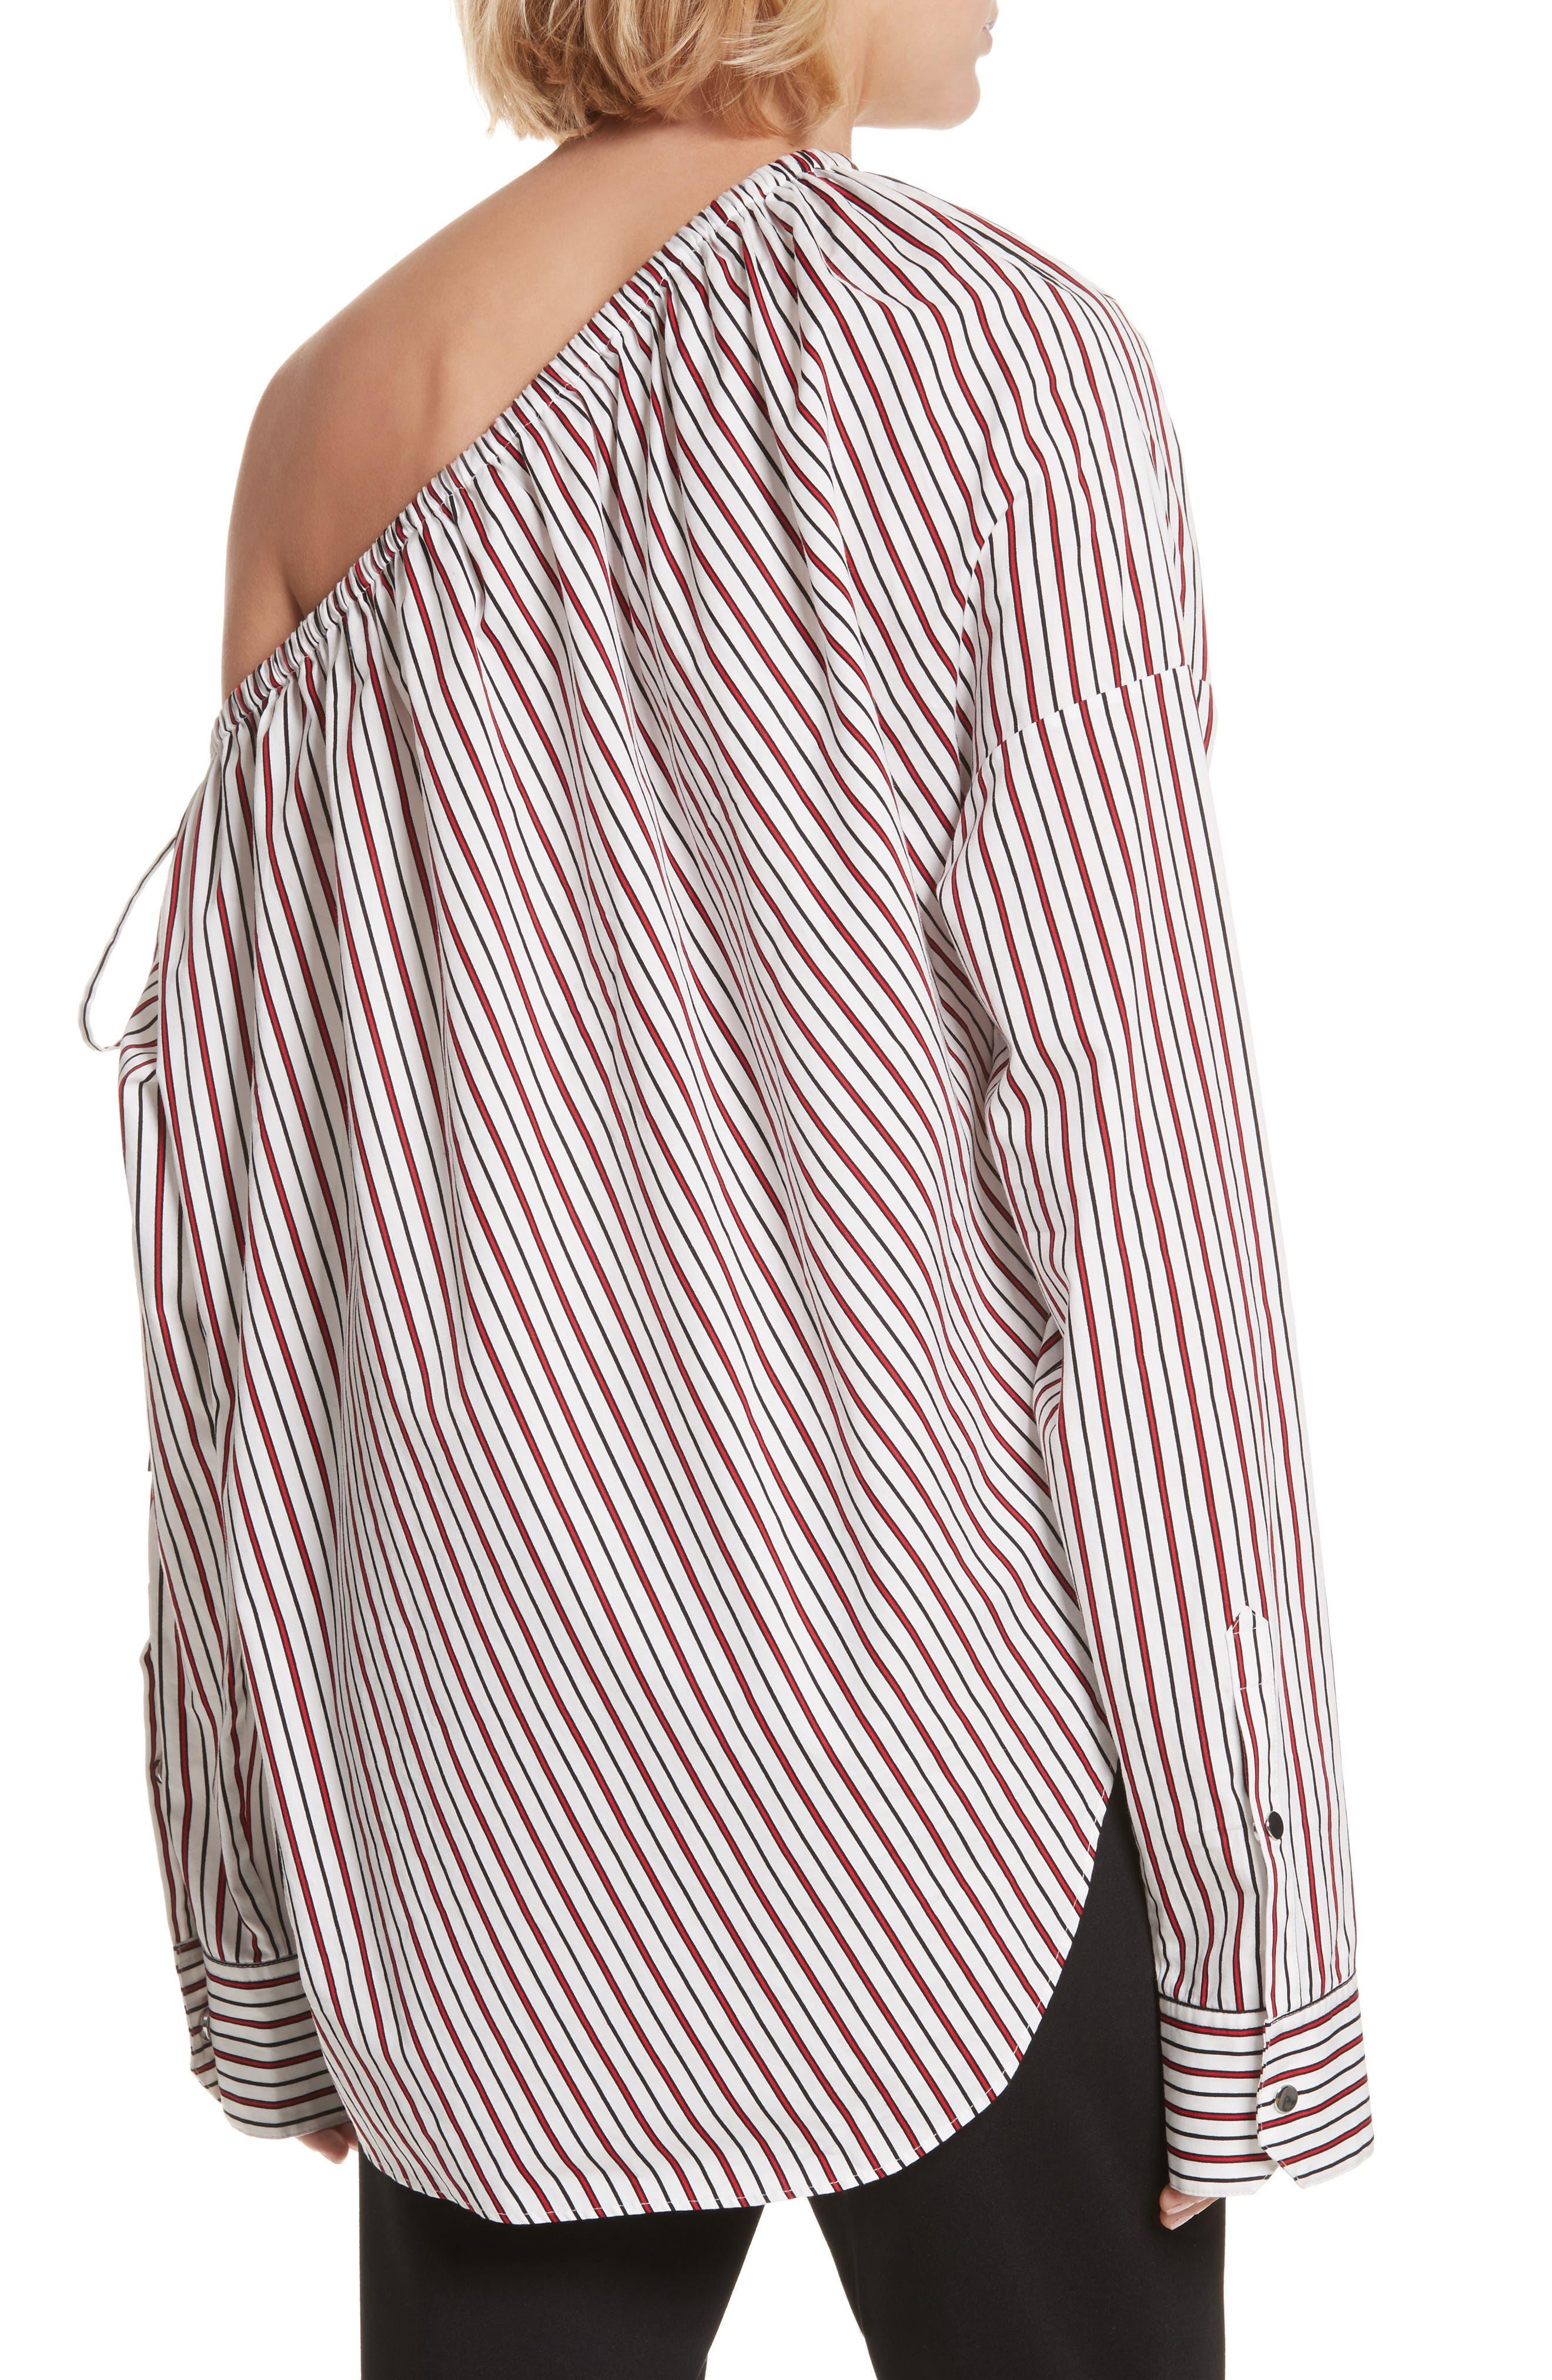 Cinched One-Shoulder Top,                             Alternate thumbnail 2, color,                             Red Stripe